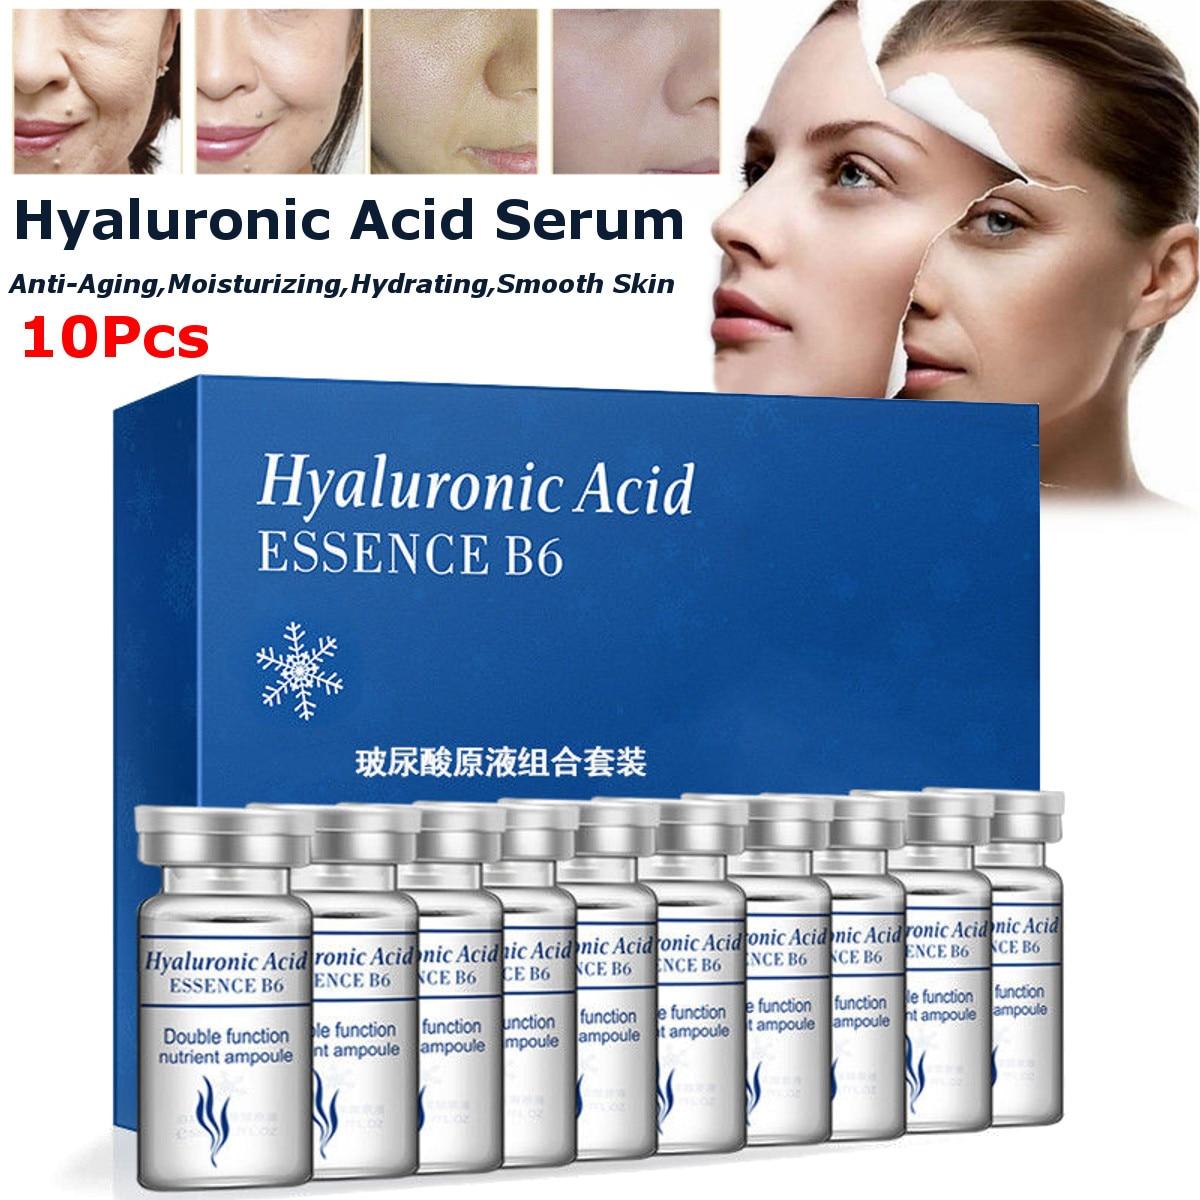 10Pcs Vitamin Hyaluronic Acid Serum Moisturizer Facial Skin Care Set Anti Wrinkle Anti Aging Collagen Essences Liquid